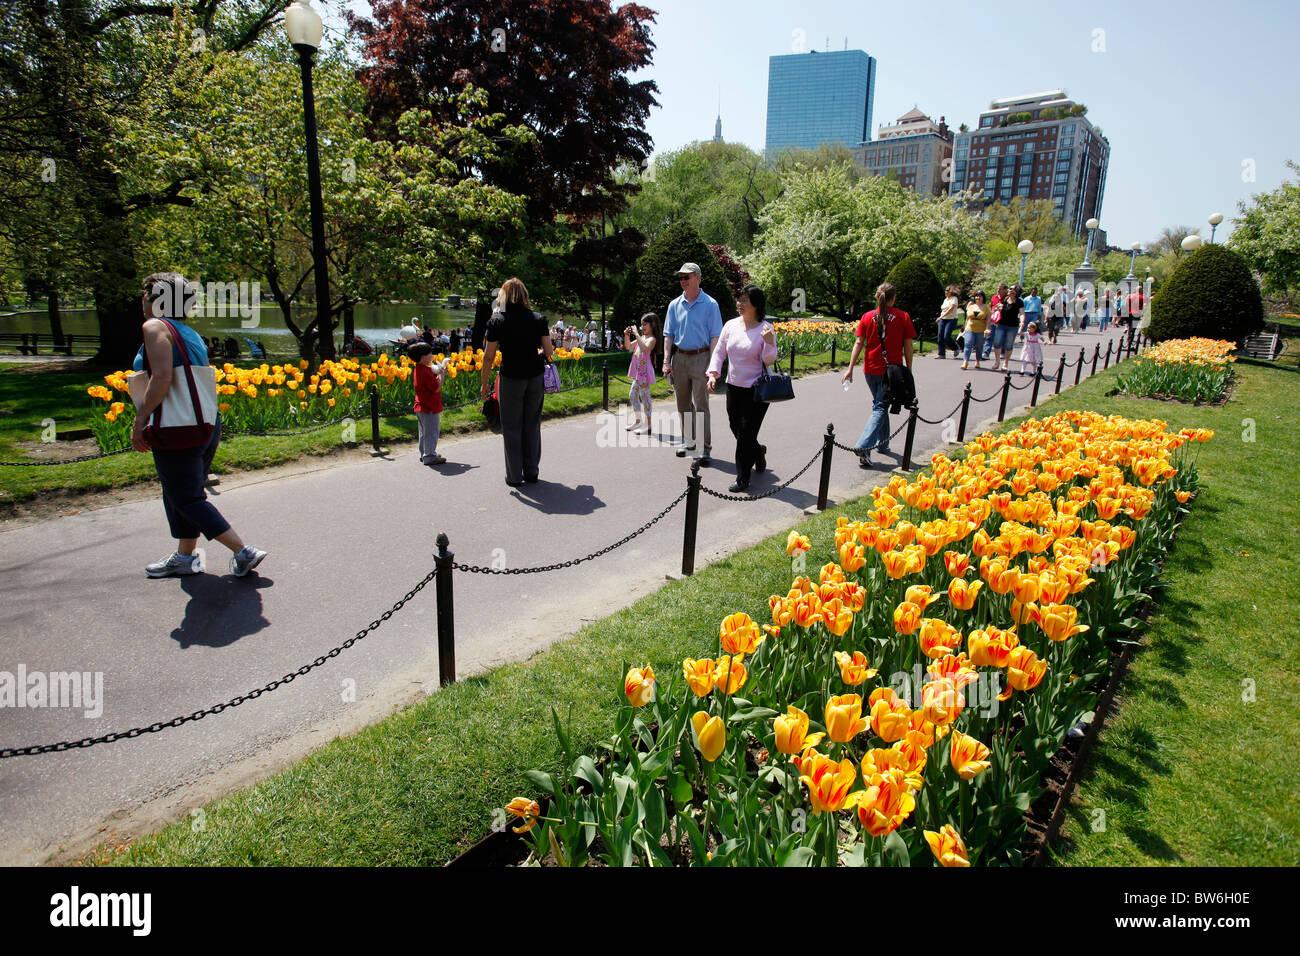 Tulips in the Public Gardens, Boston, Massachusetts - Stock Image